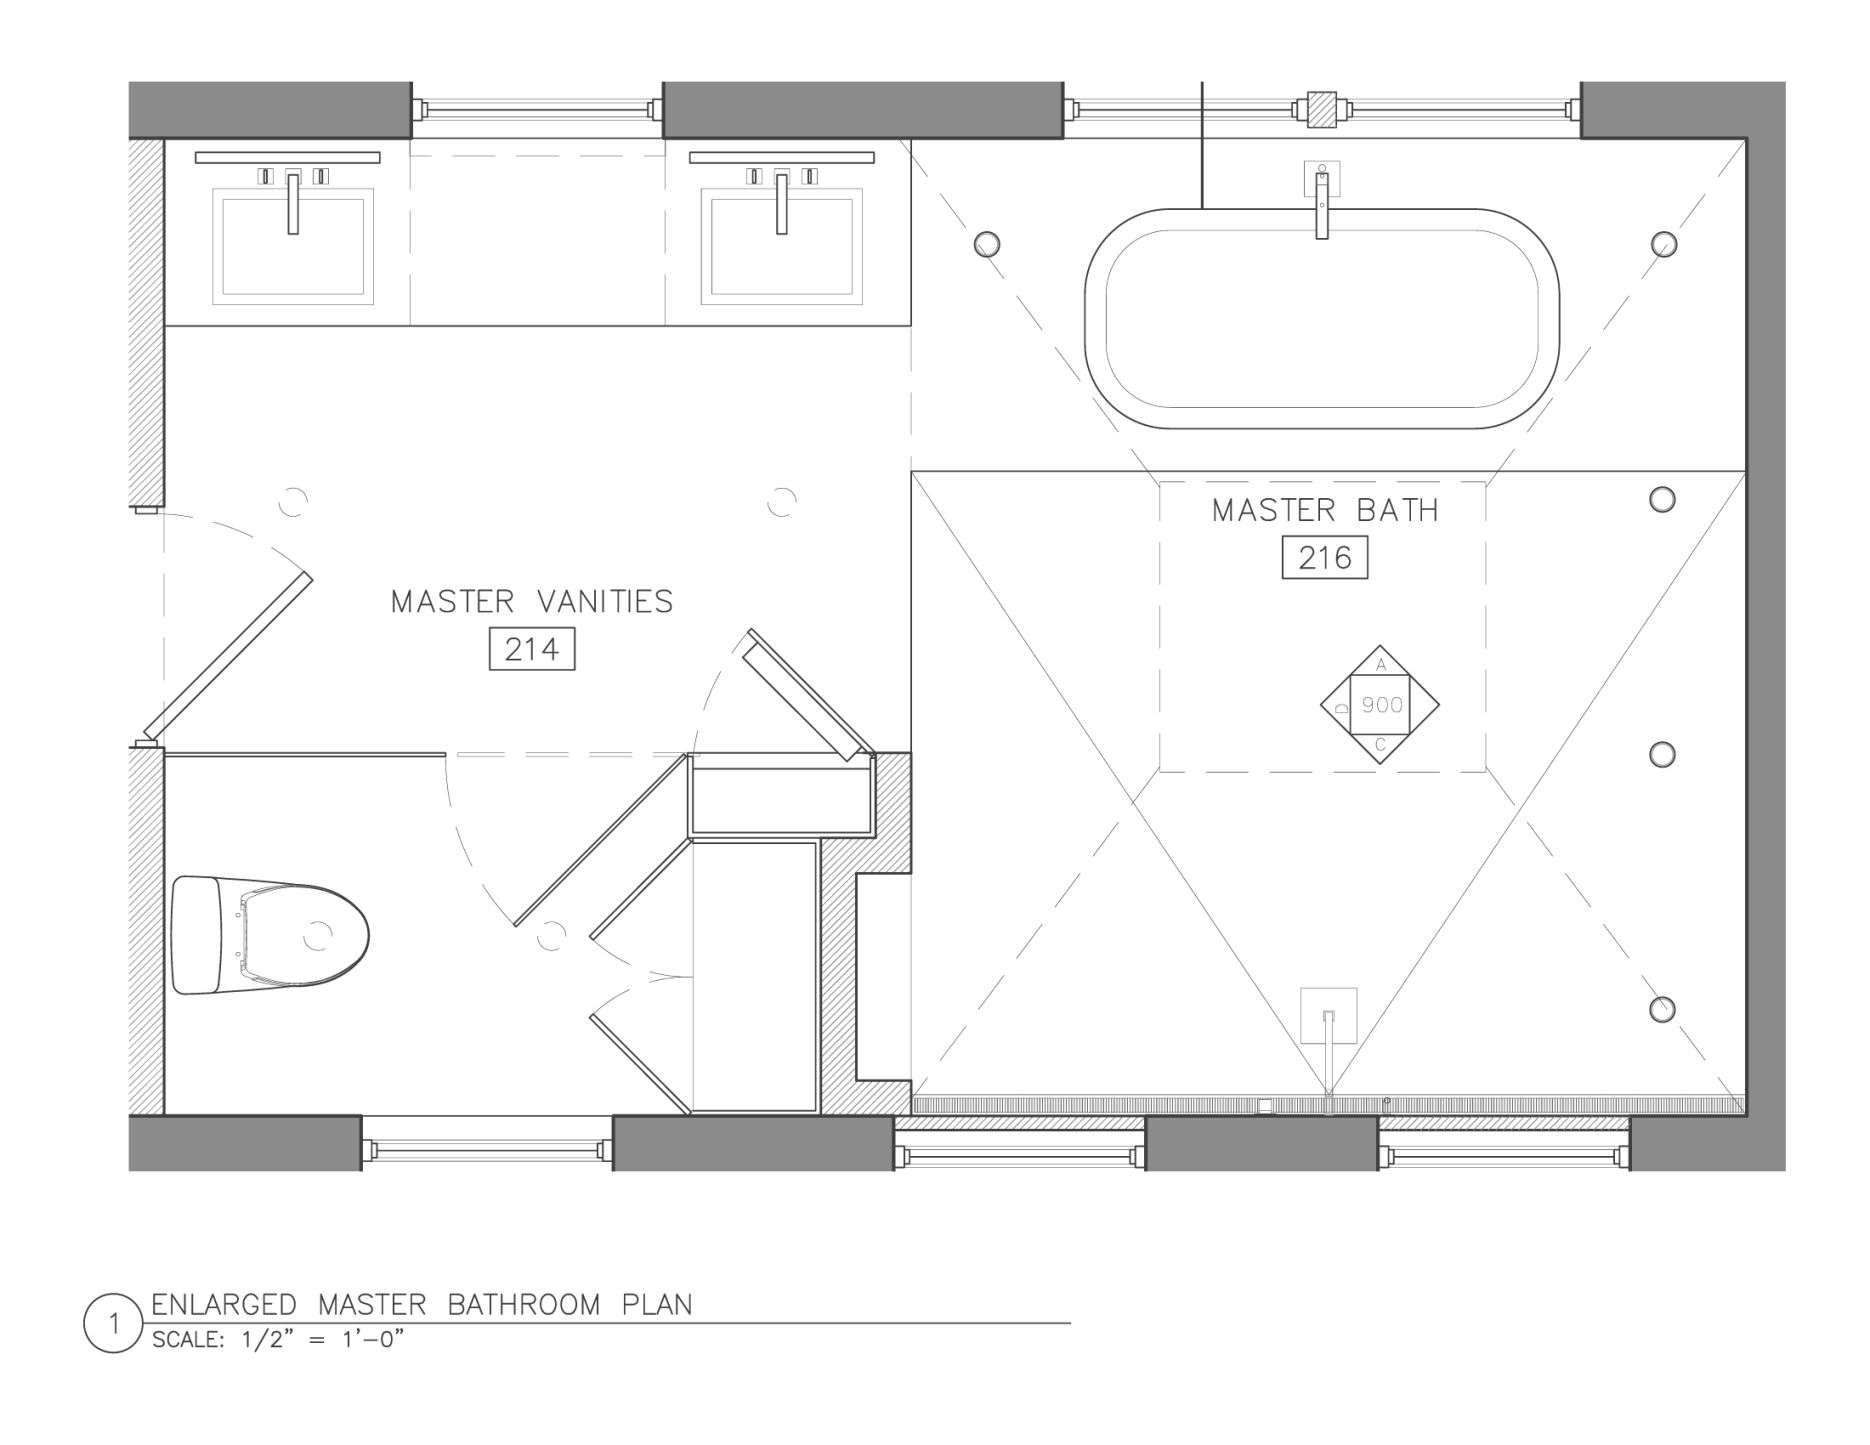 5×5 Bathroom Layout Awesome Awesome Ideas Bathroom Floor Plans 5